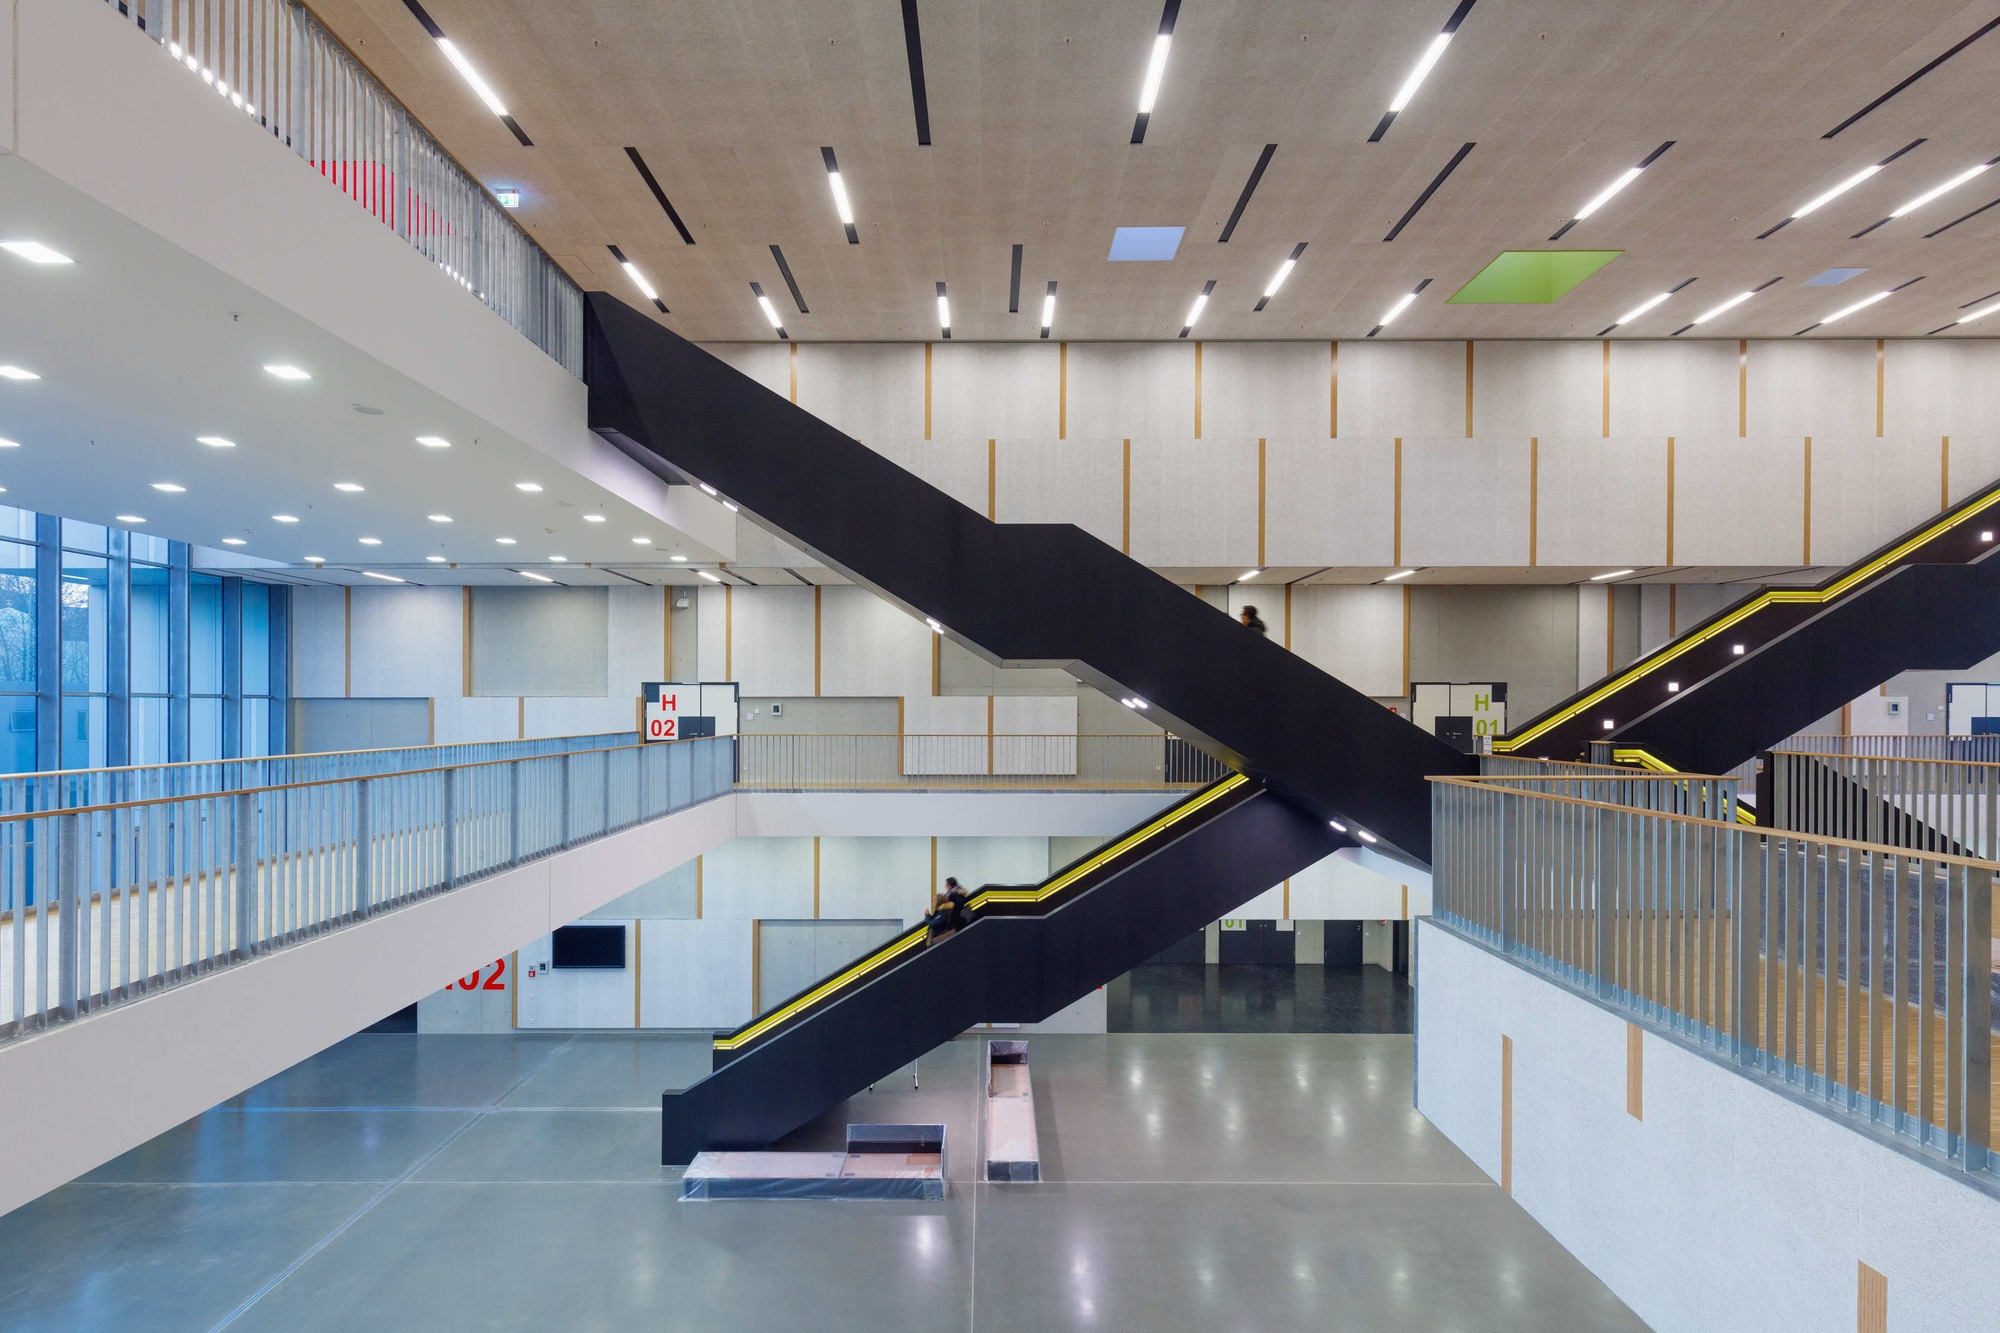 gallery of c a r l auditorium at rwth aachen university schmidt hammer lassen architects